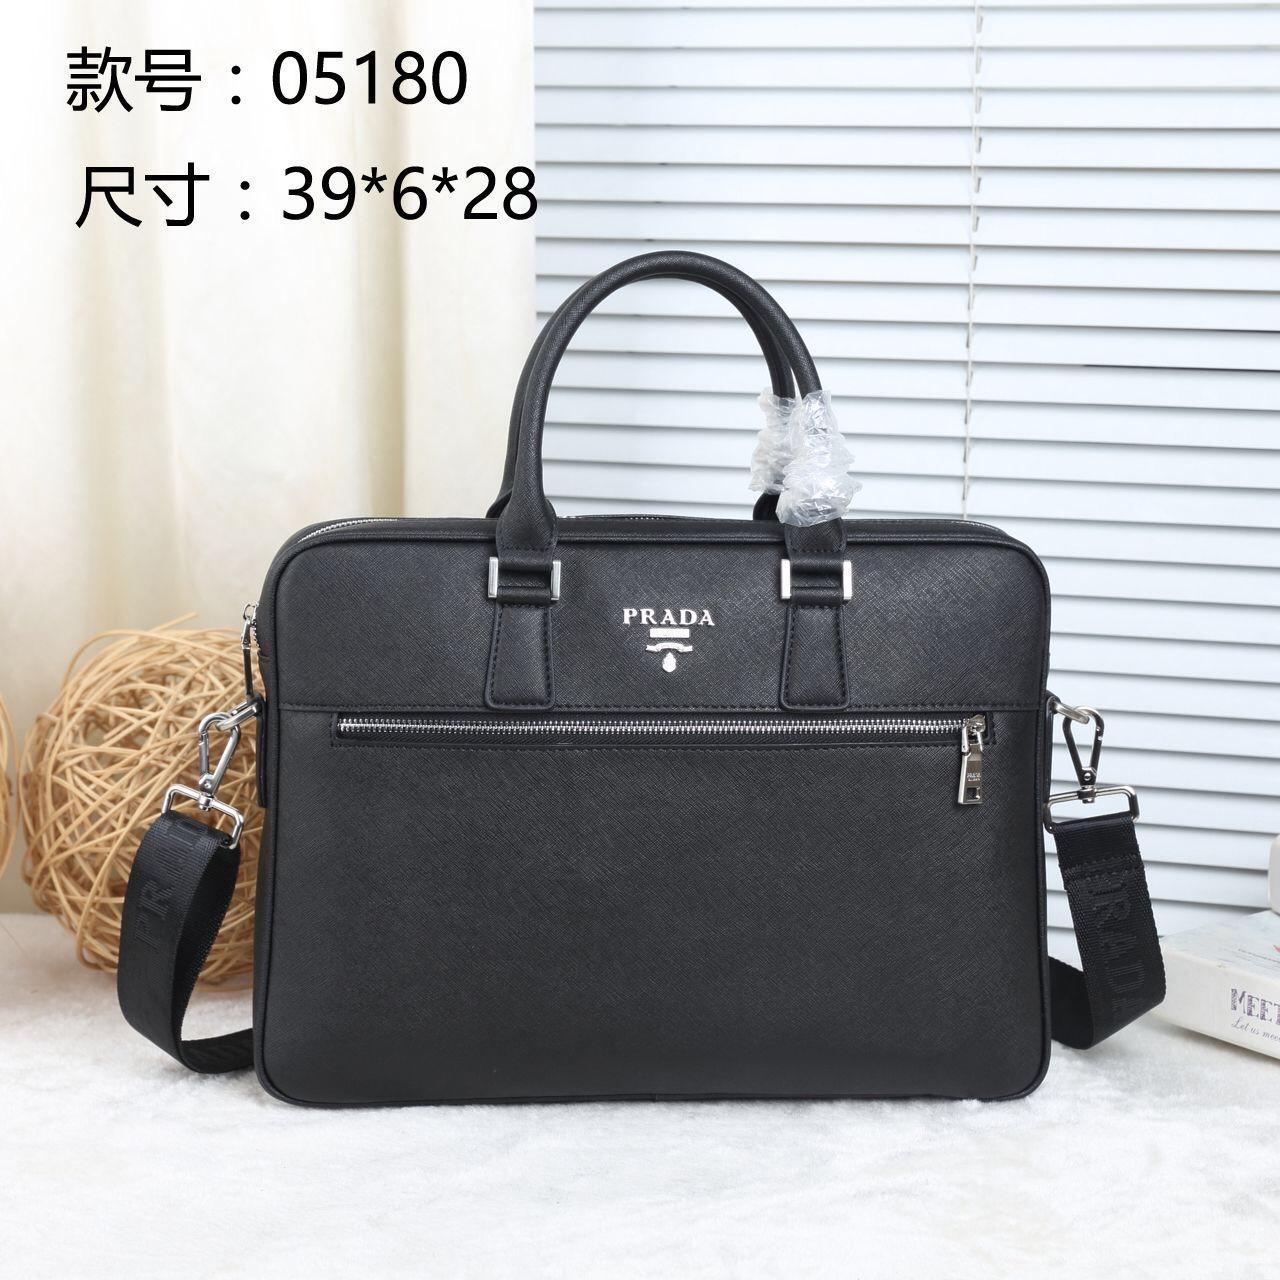 4c790645aaed1 Famous Brand Business Men Briefcase Bag Man Shoulder Bag Luxury Leather  Laptop Bag Simple Men S Handbag Bolsa Maleta Briefcase On Wheels Aluminum  Briefcase ...